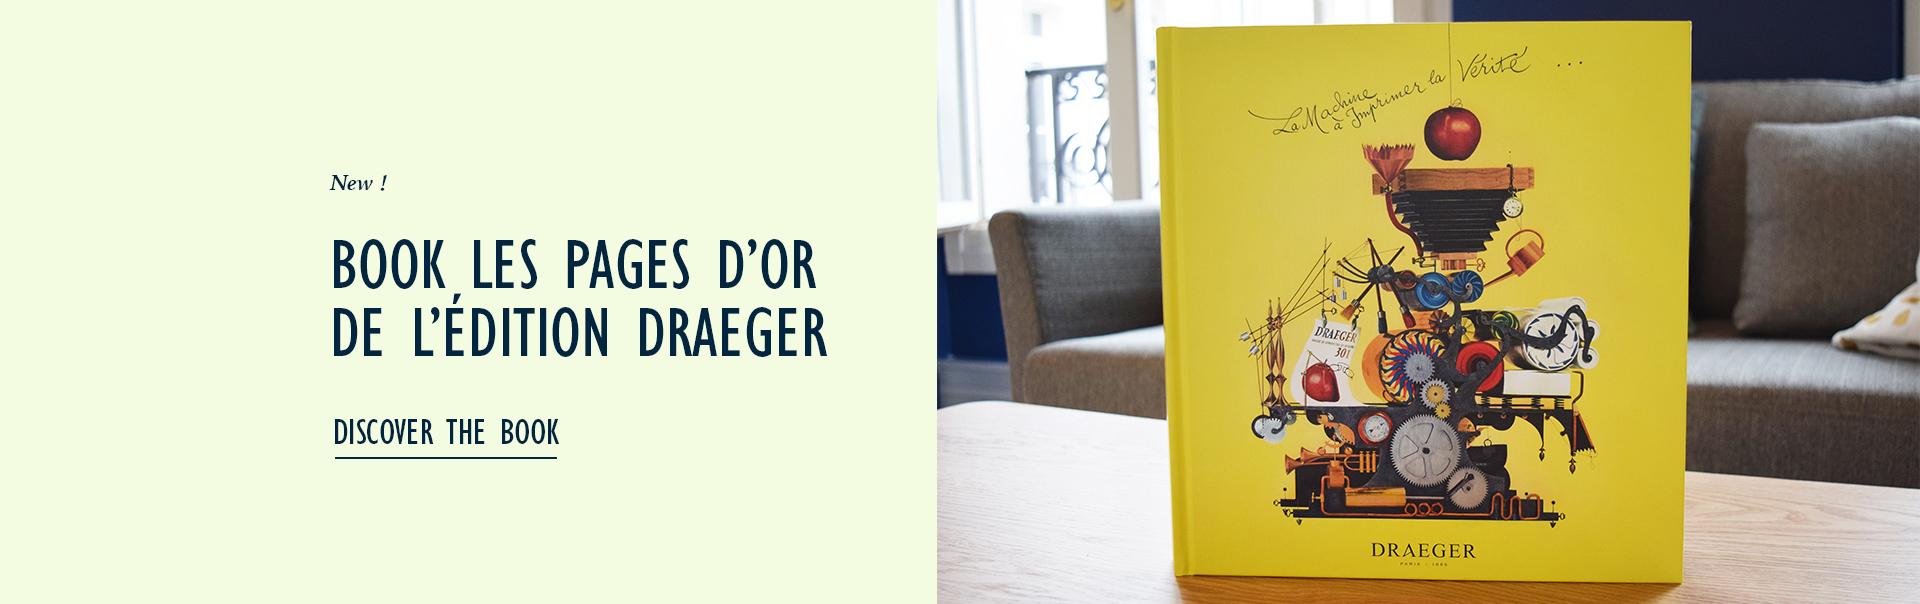 Book Draeger